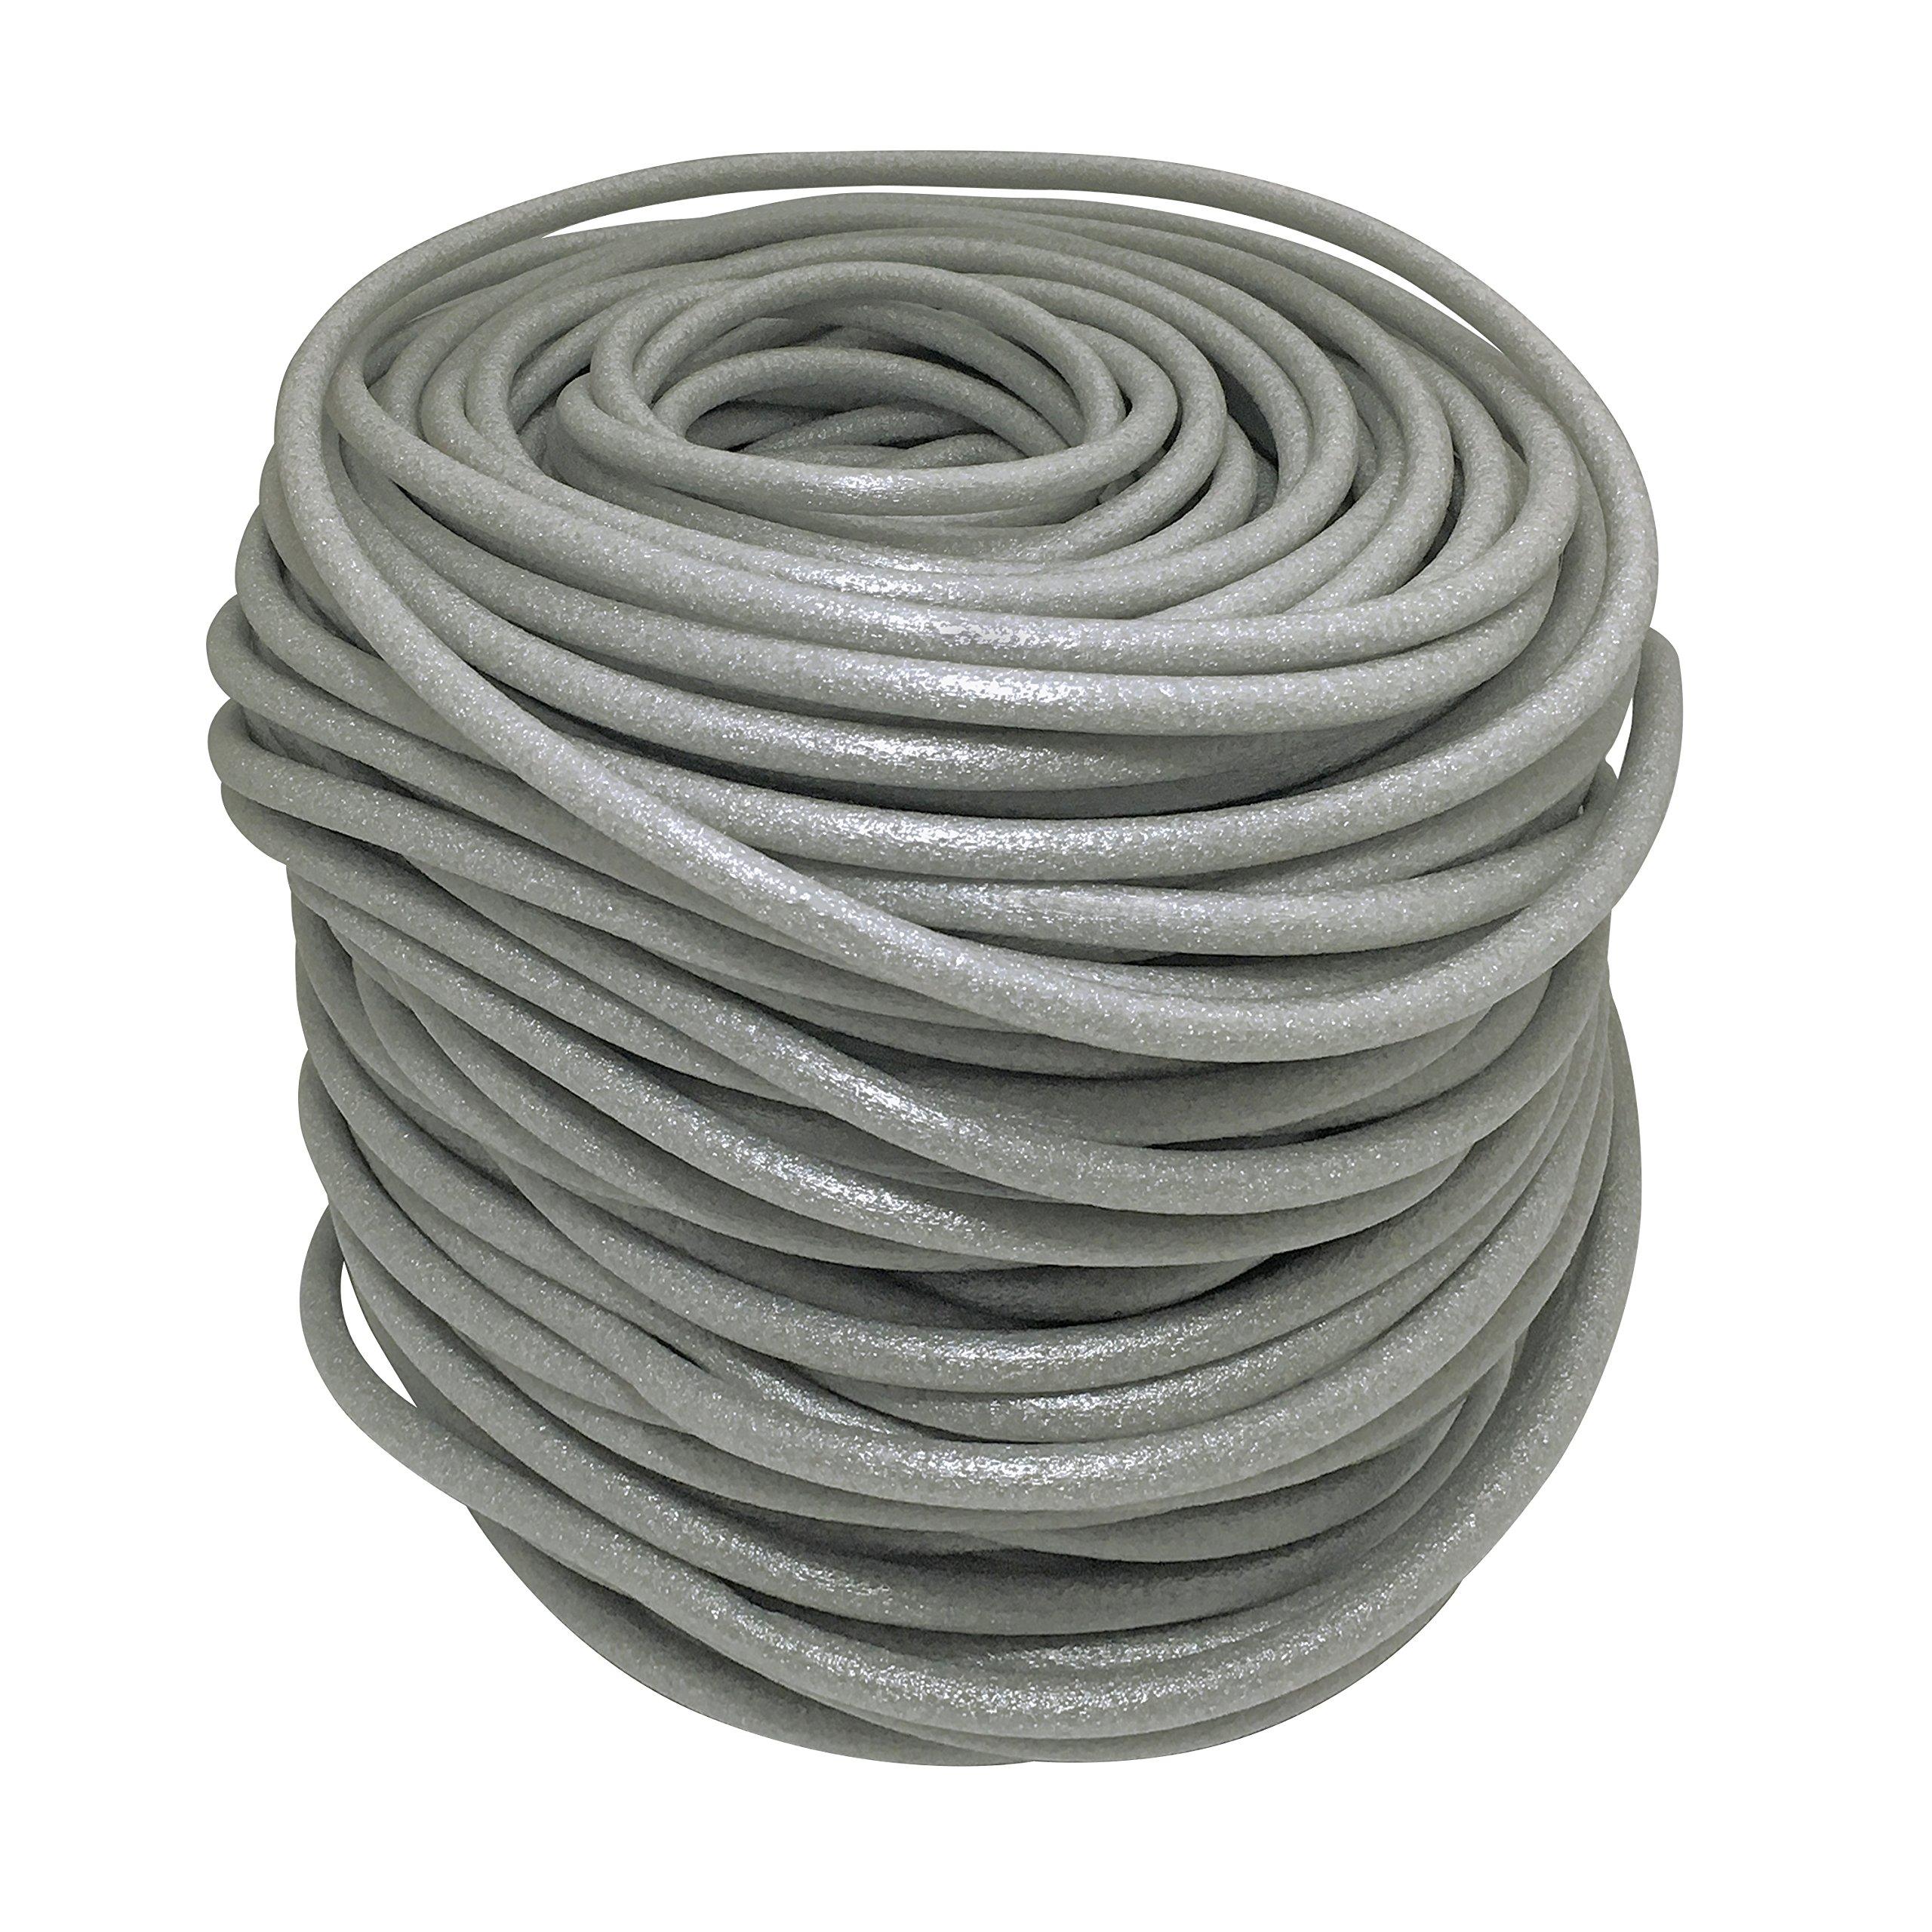 Frost King C21CP Caulk Saver Bulk Contractor Pack, 3/8 inch Diameter x 350' Long,,, Grey